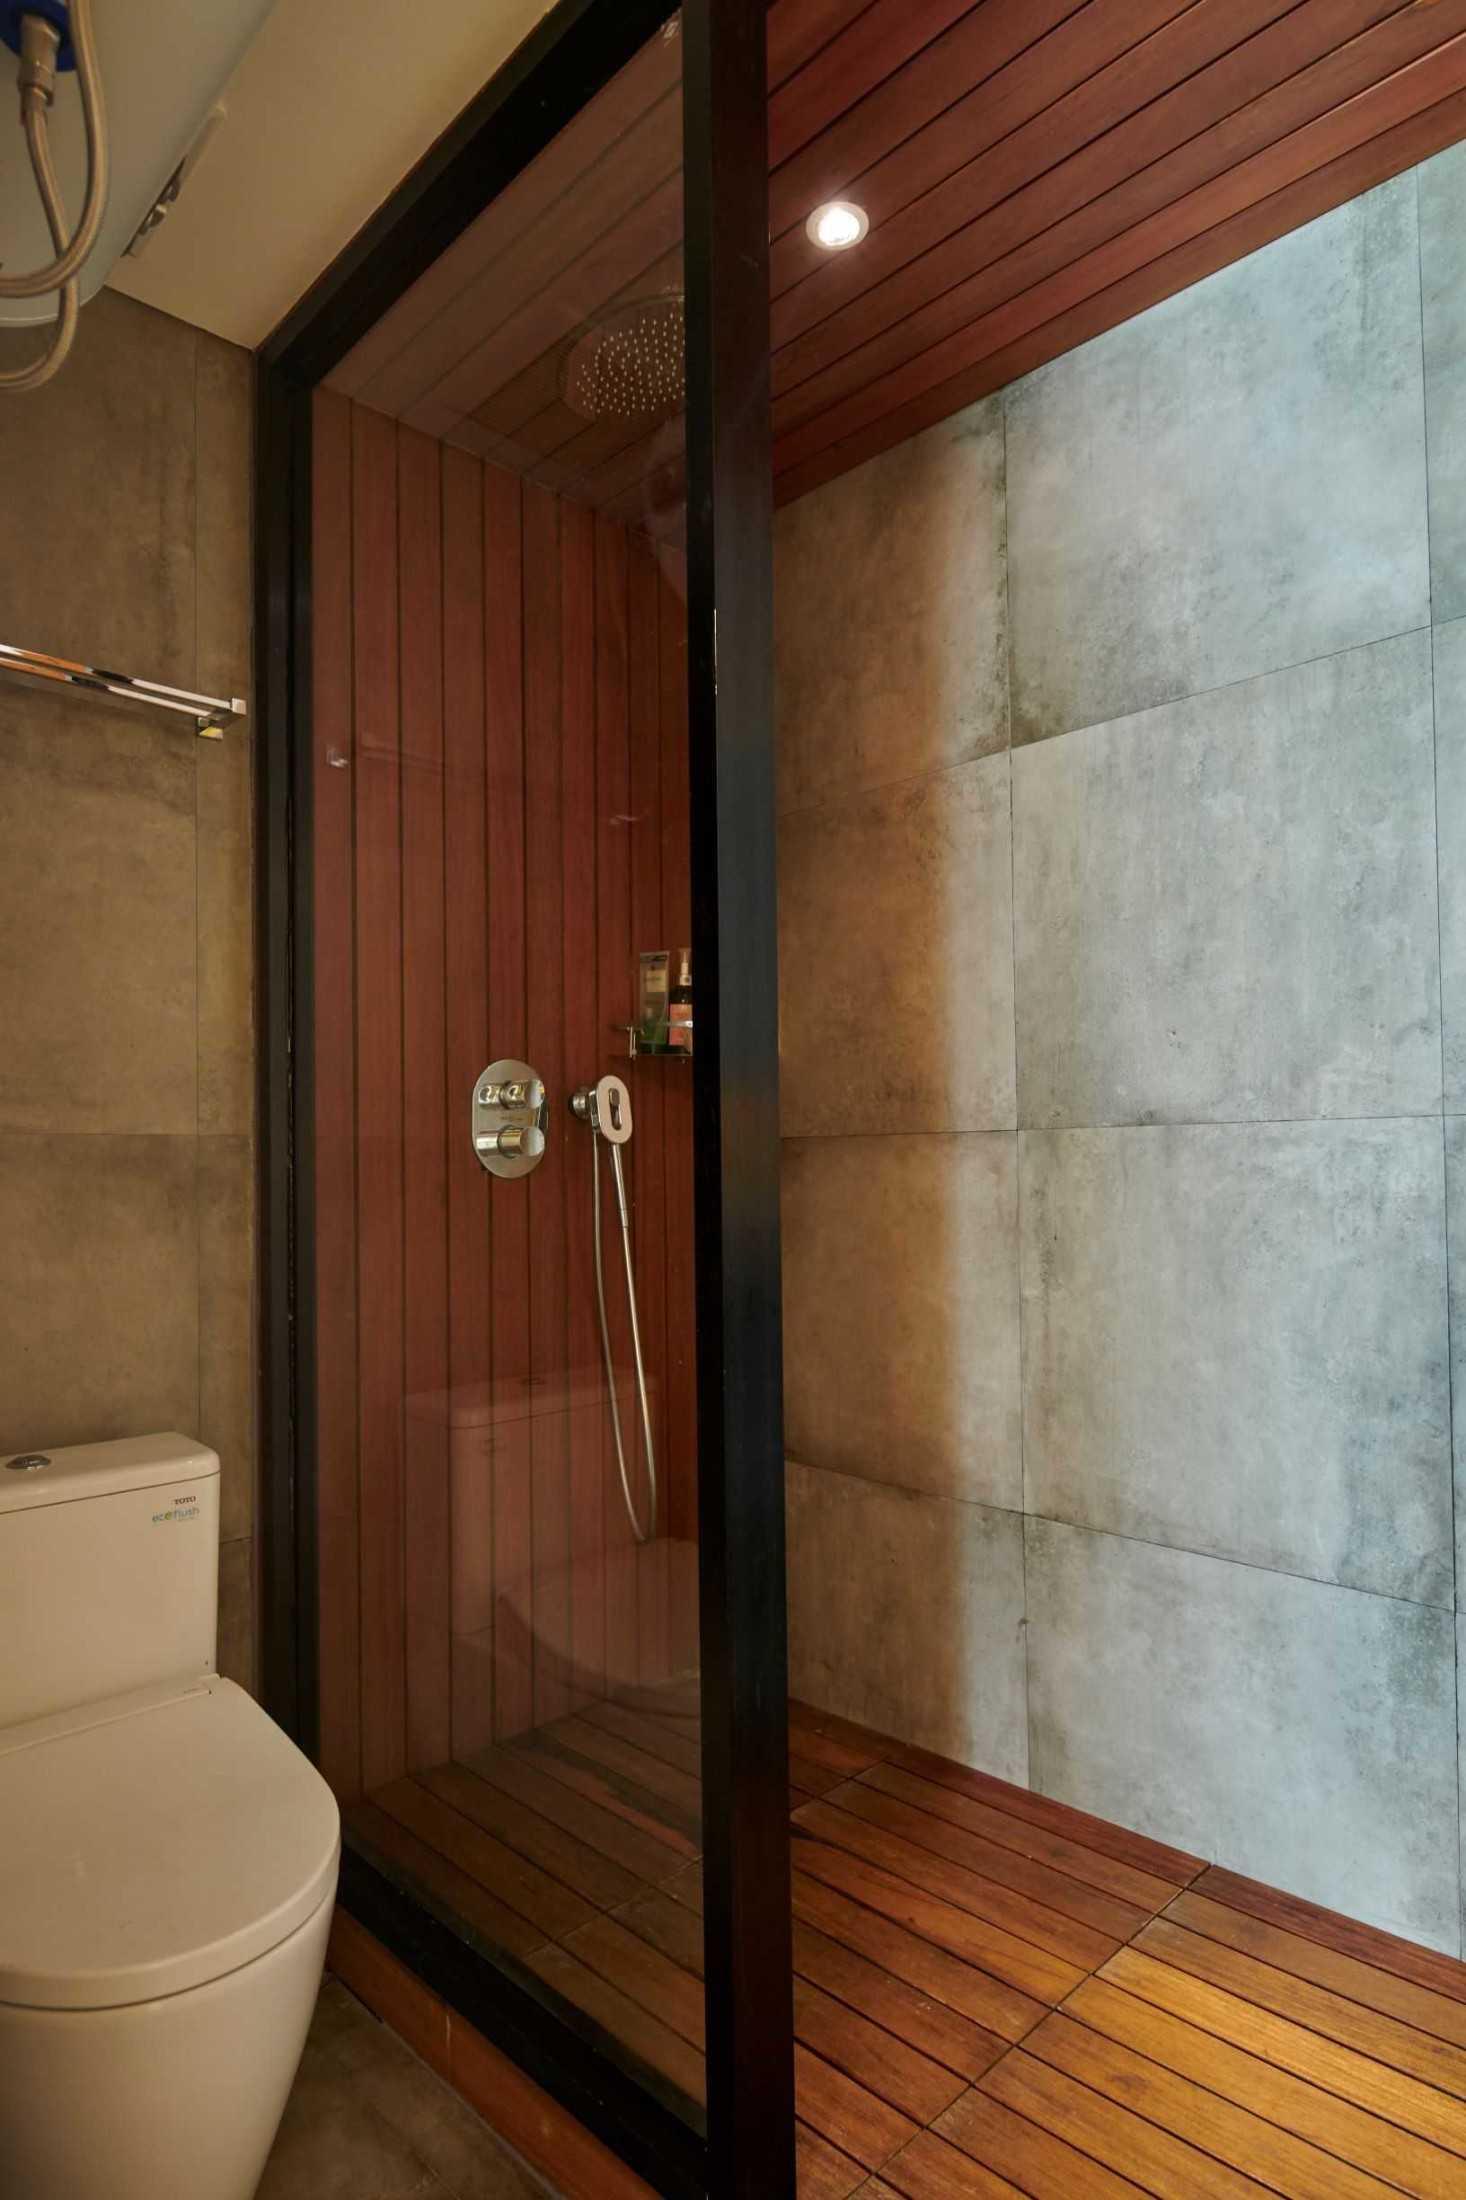 Hadivincent Architects Tb Apartment Lippo Cikarang, Bekasi, Jawa Barat, Indonesia Lippo Cikarang, Bekasi, Jawa Barat, Indonesia Hadi-Vincent-Architects-Tb-Apartment  71001